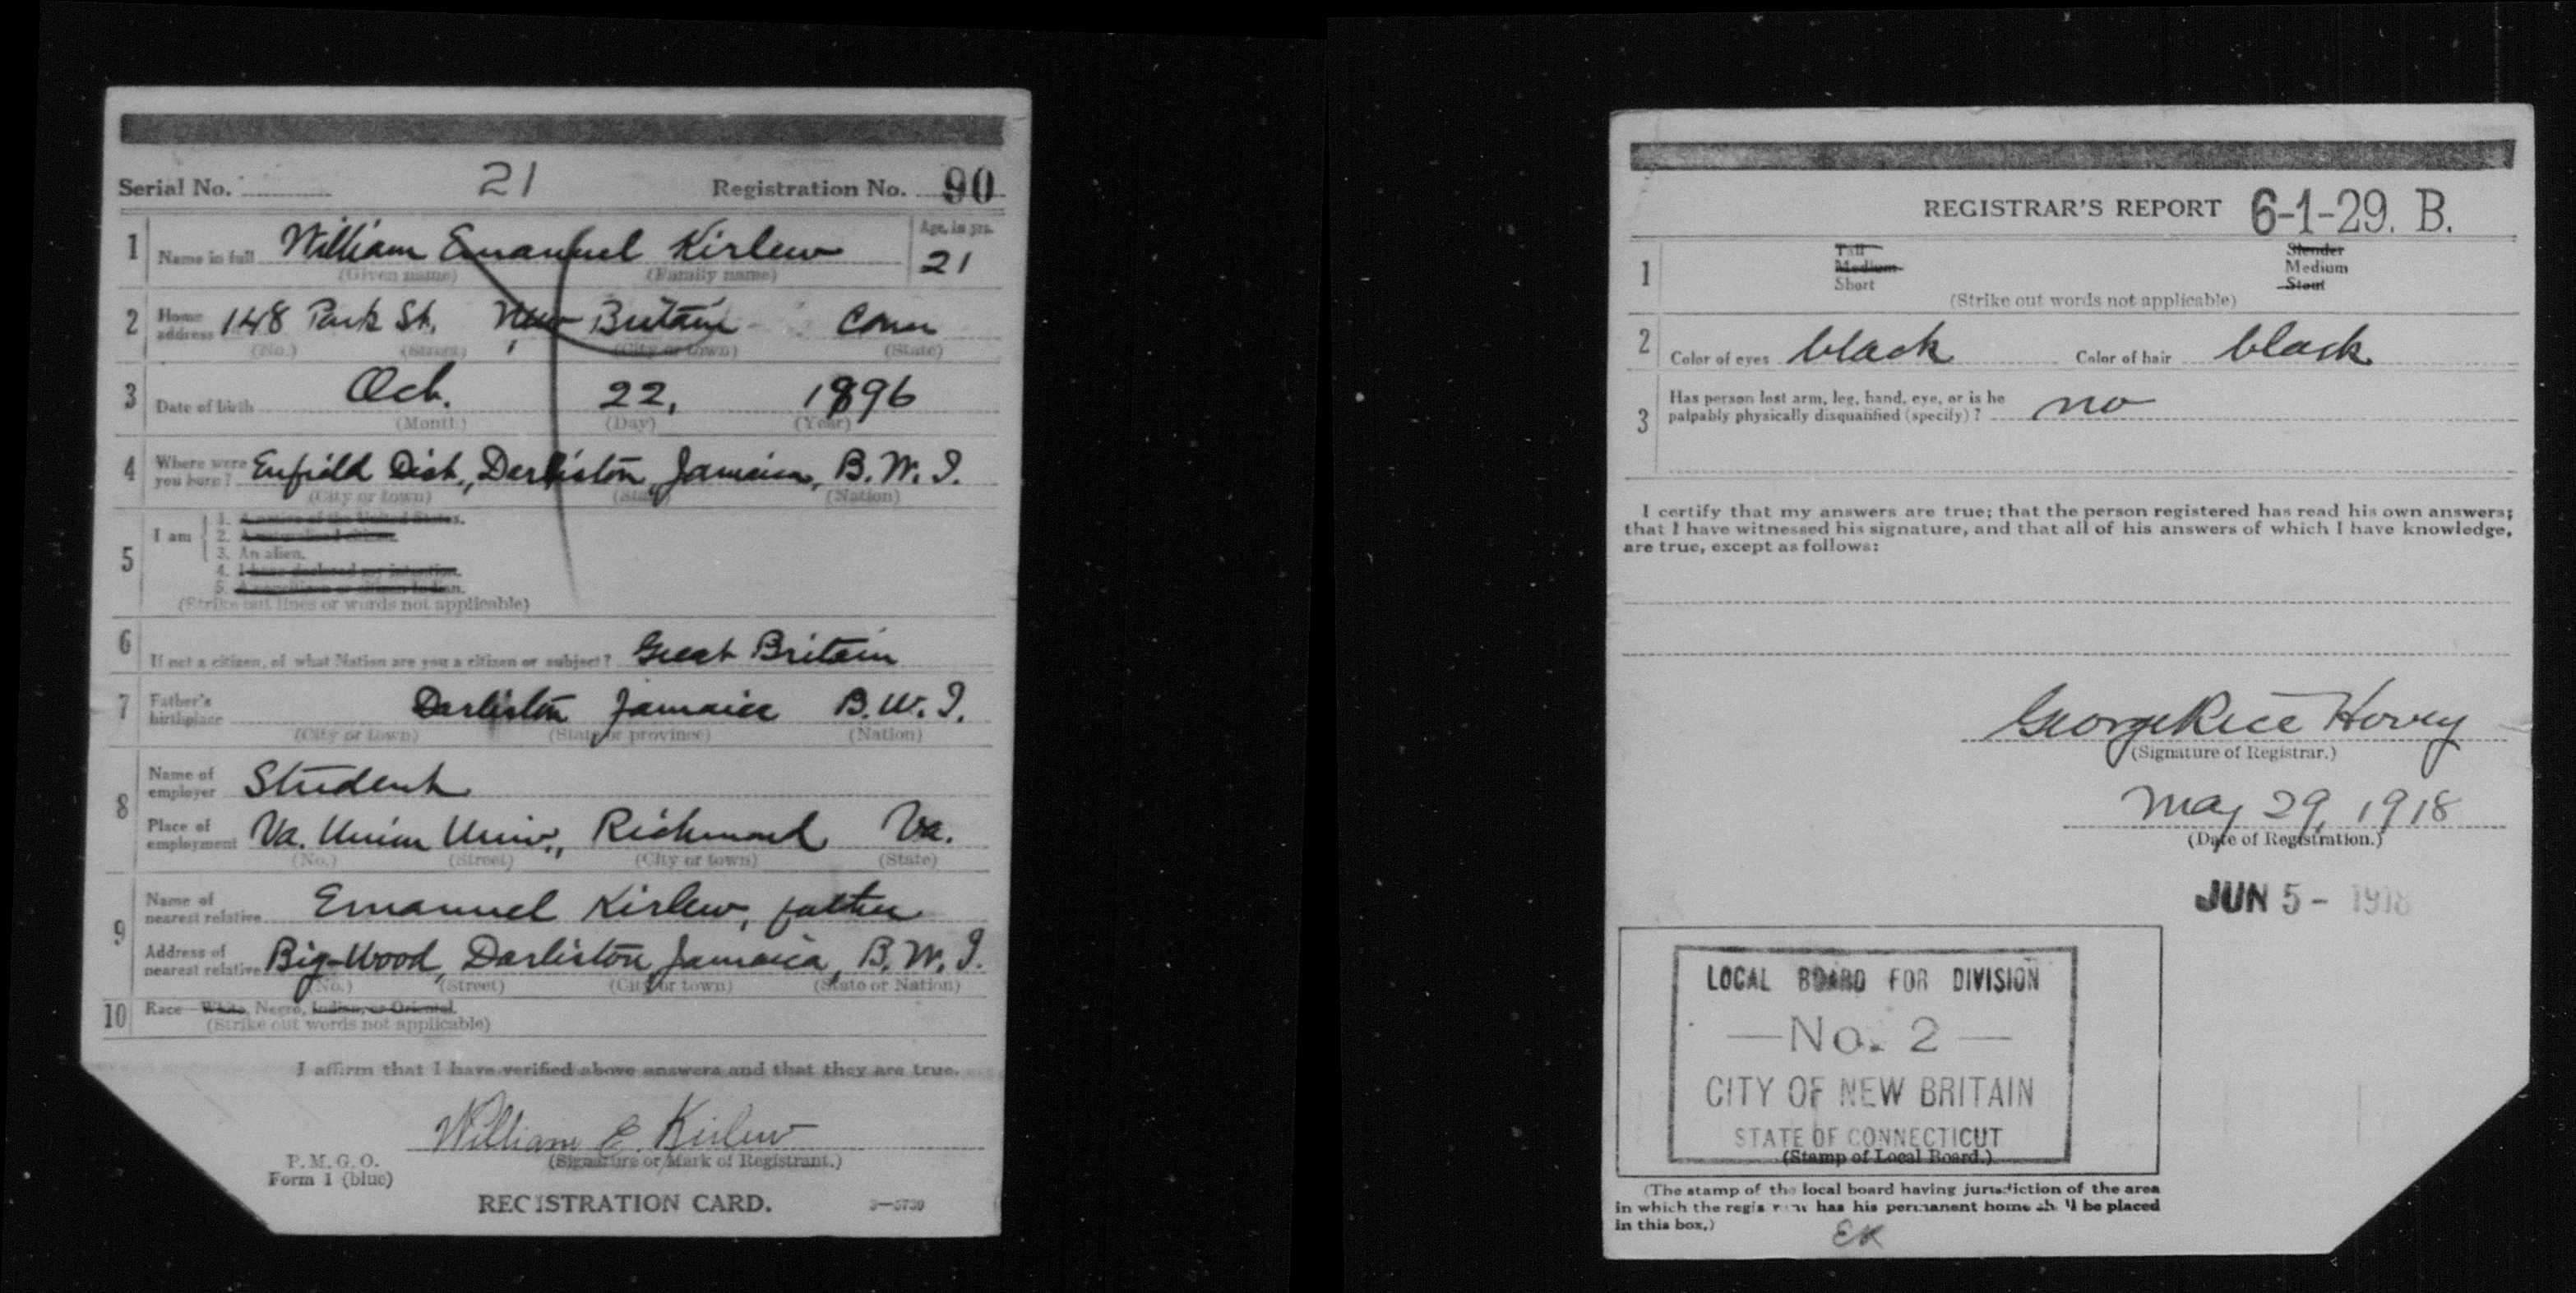 WWI Draft Registration Card for William Kirlew